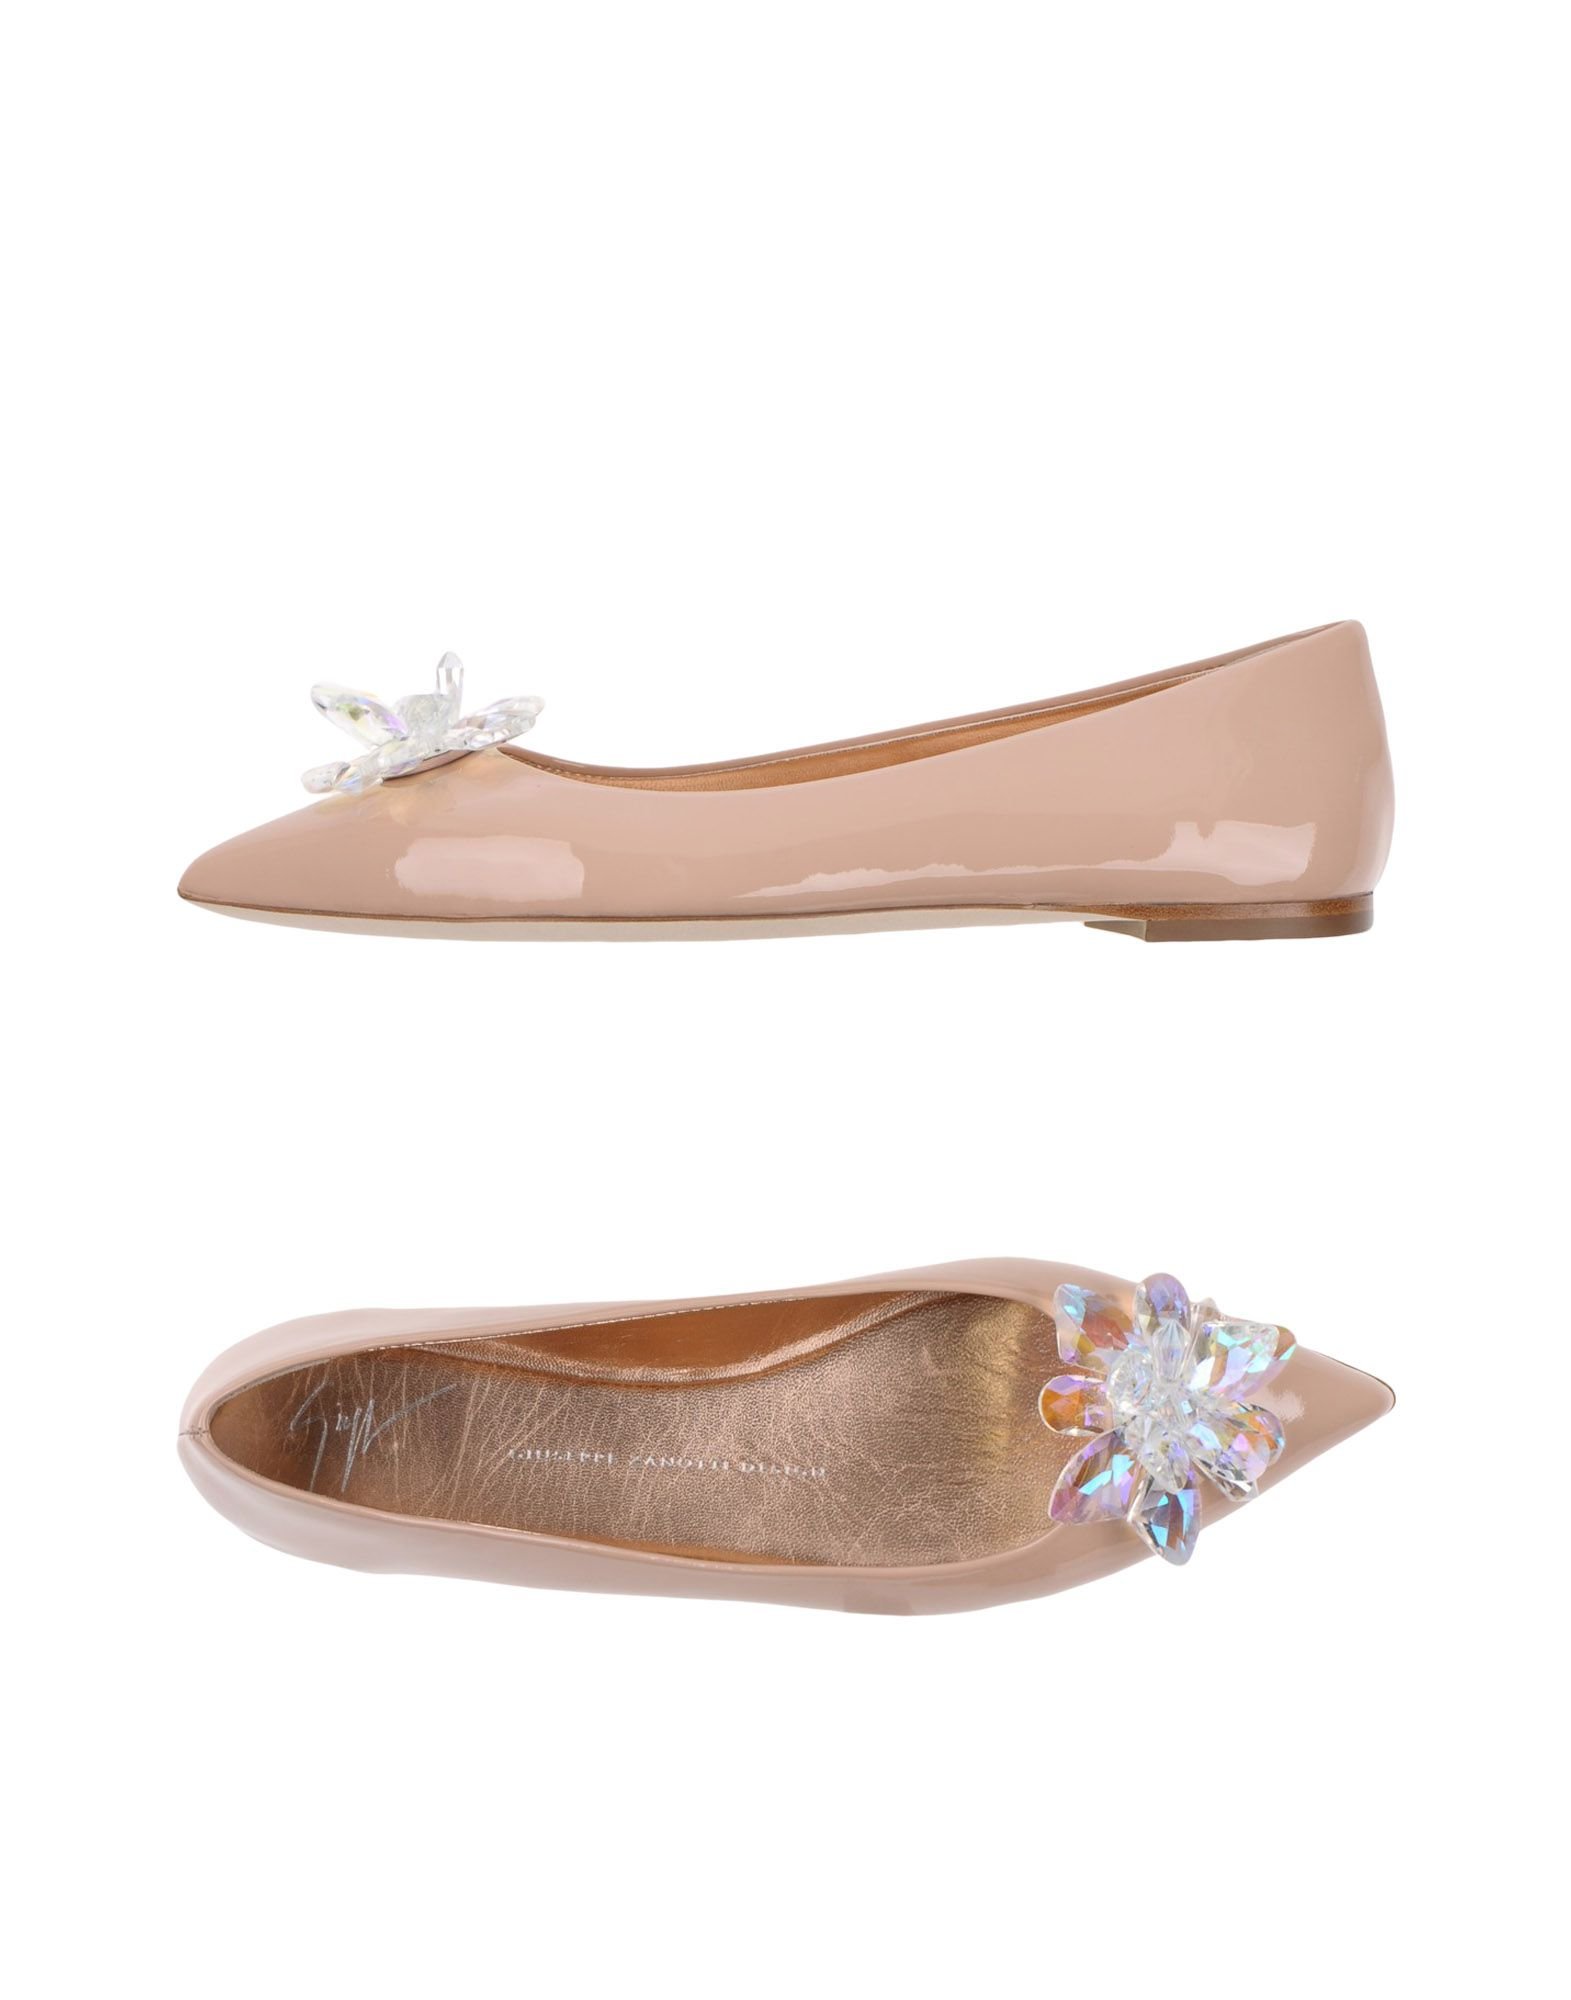 Giuseppe Zanotti Ballerinas 11357568GK Damen  11357568GK Ballerinas Neue Schuhe ed09fc